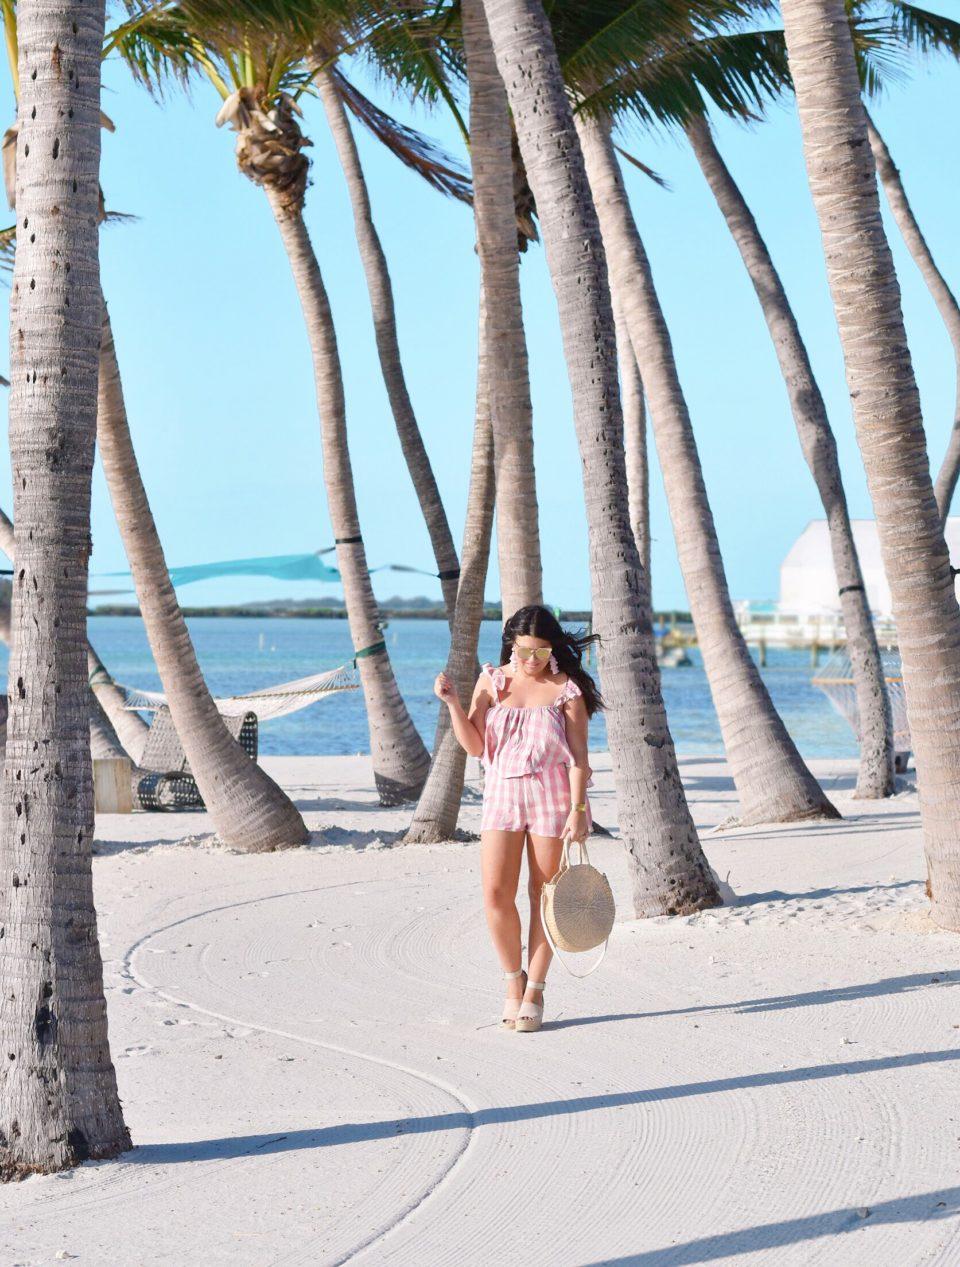 Amara Cay Resort Islamorada hotel - Pink Gingham Two Piece Set - The Keys Style